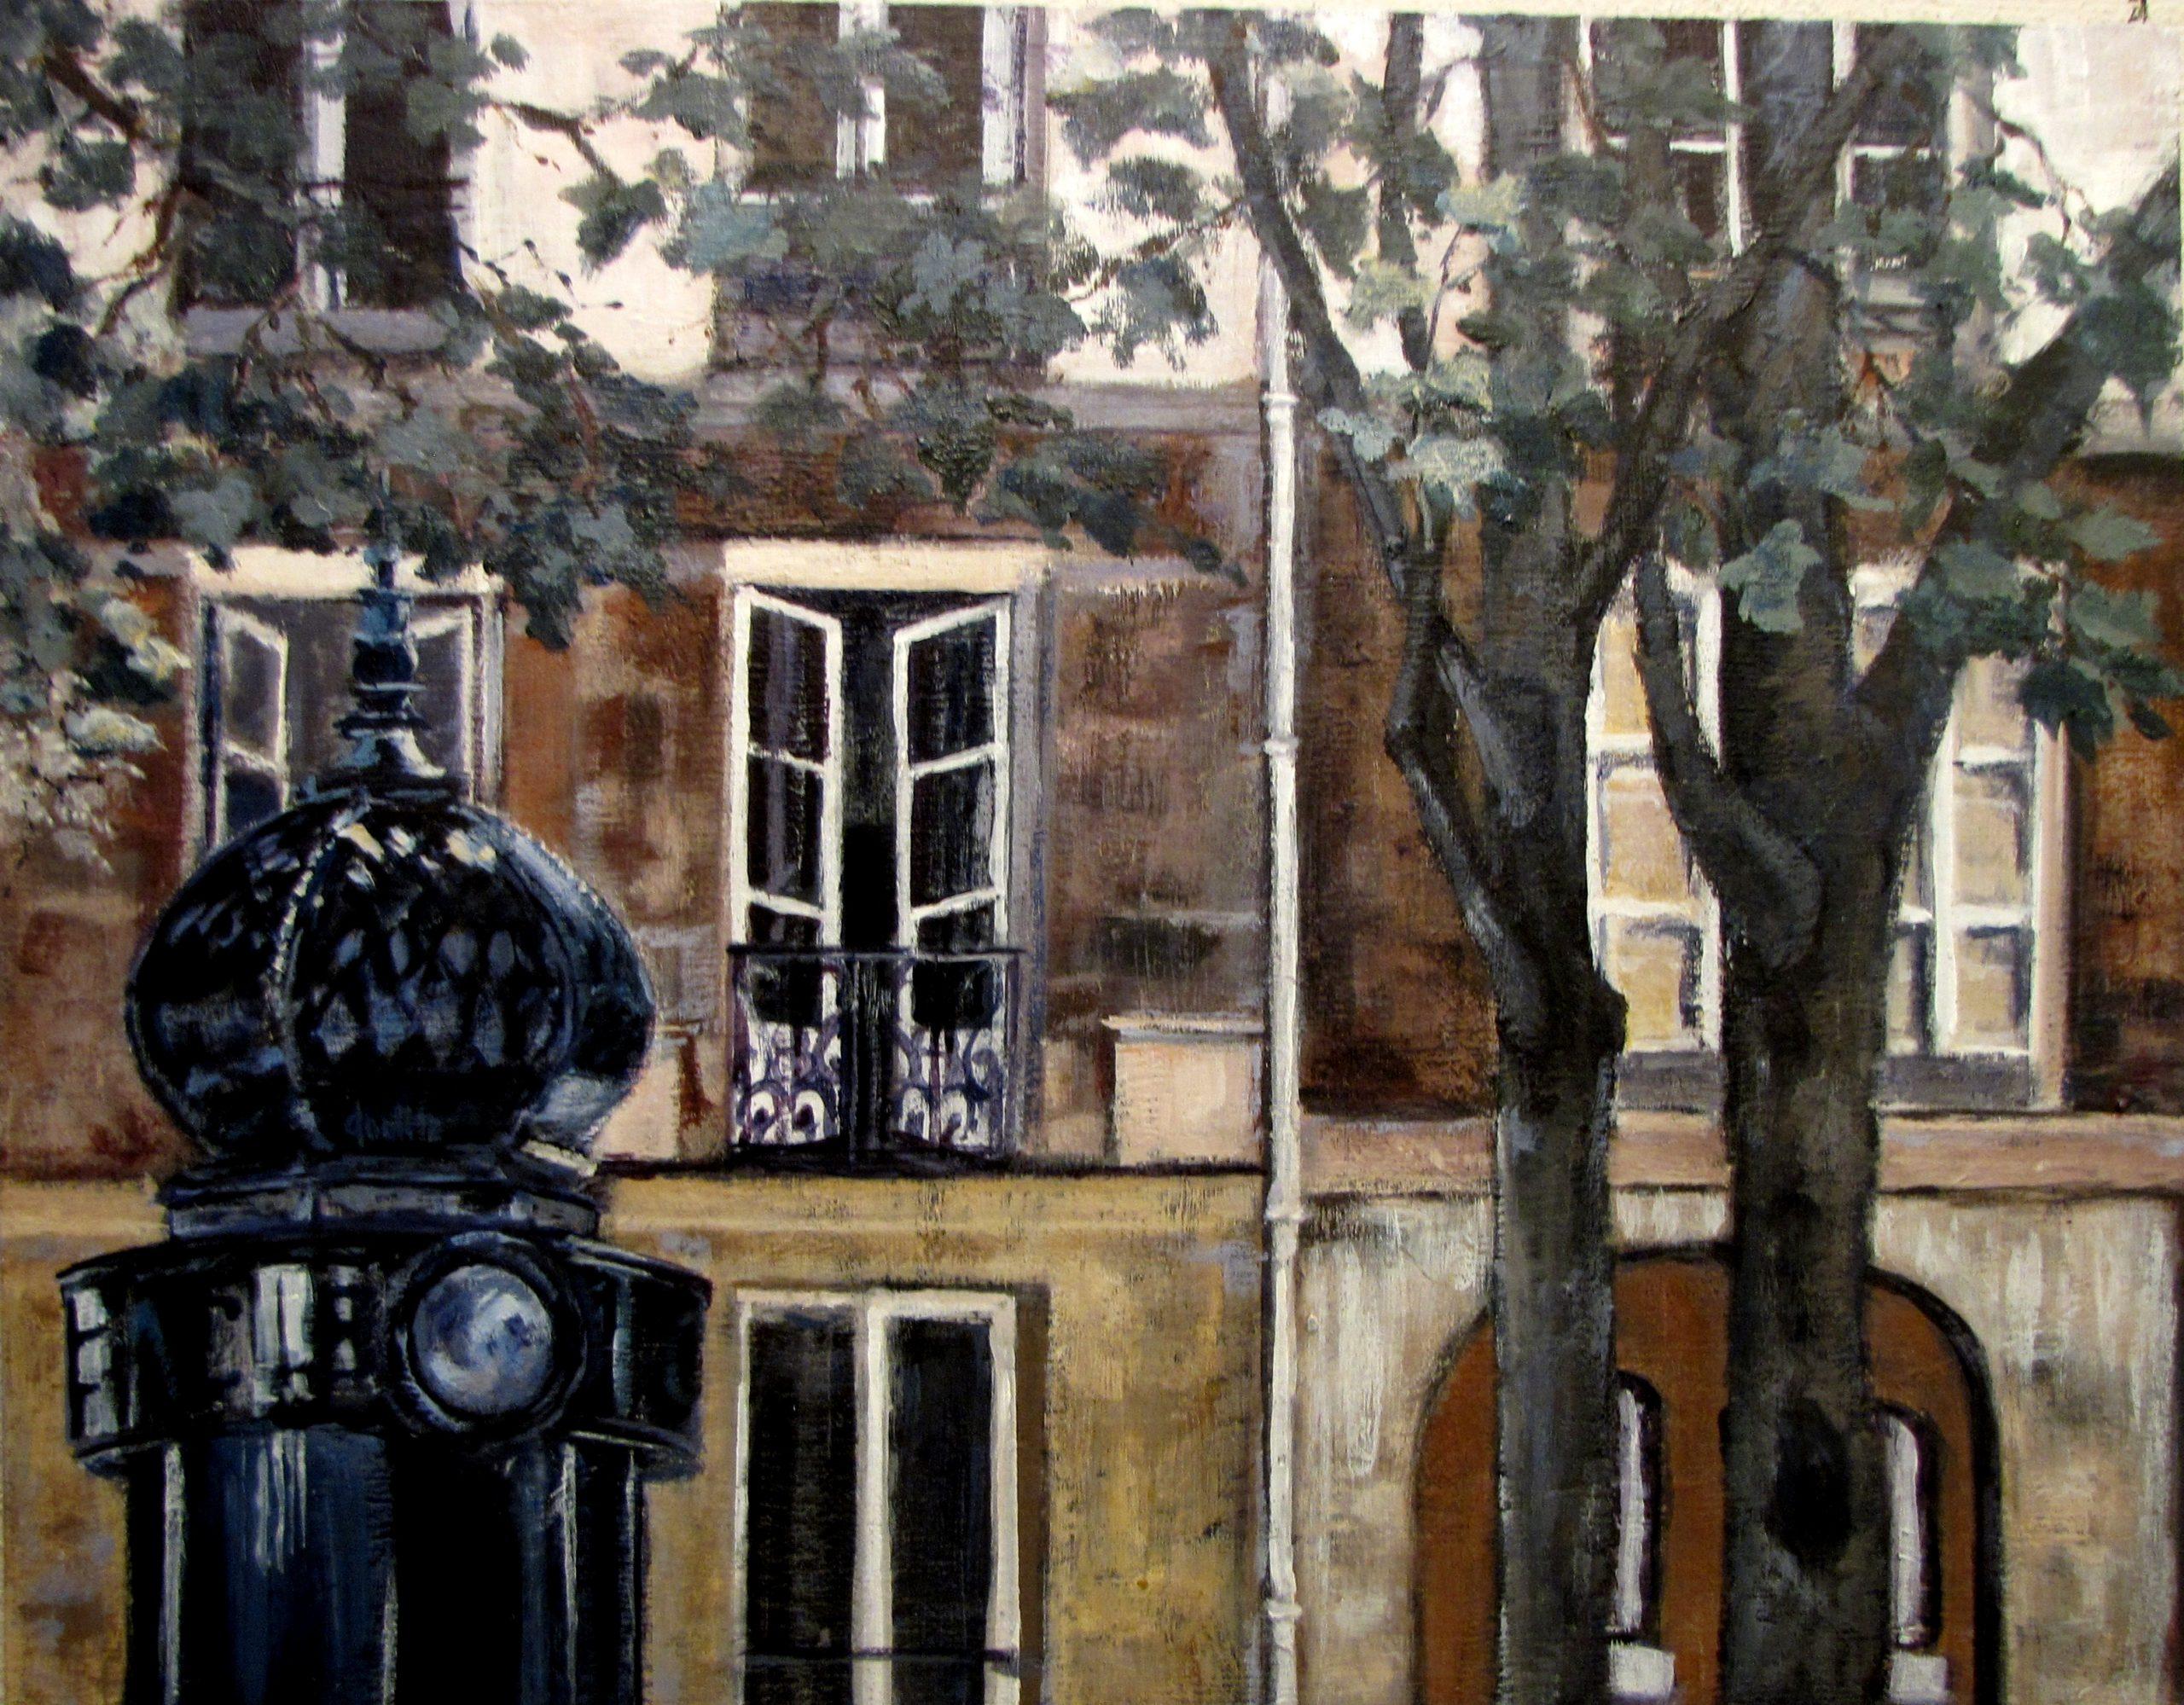 "Paris windows, Apres midi - 14"" x 18"" Acrylic on wood cradle. $750"